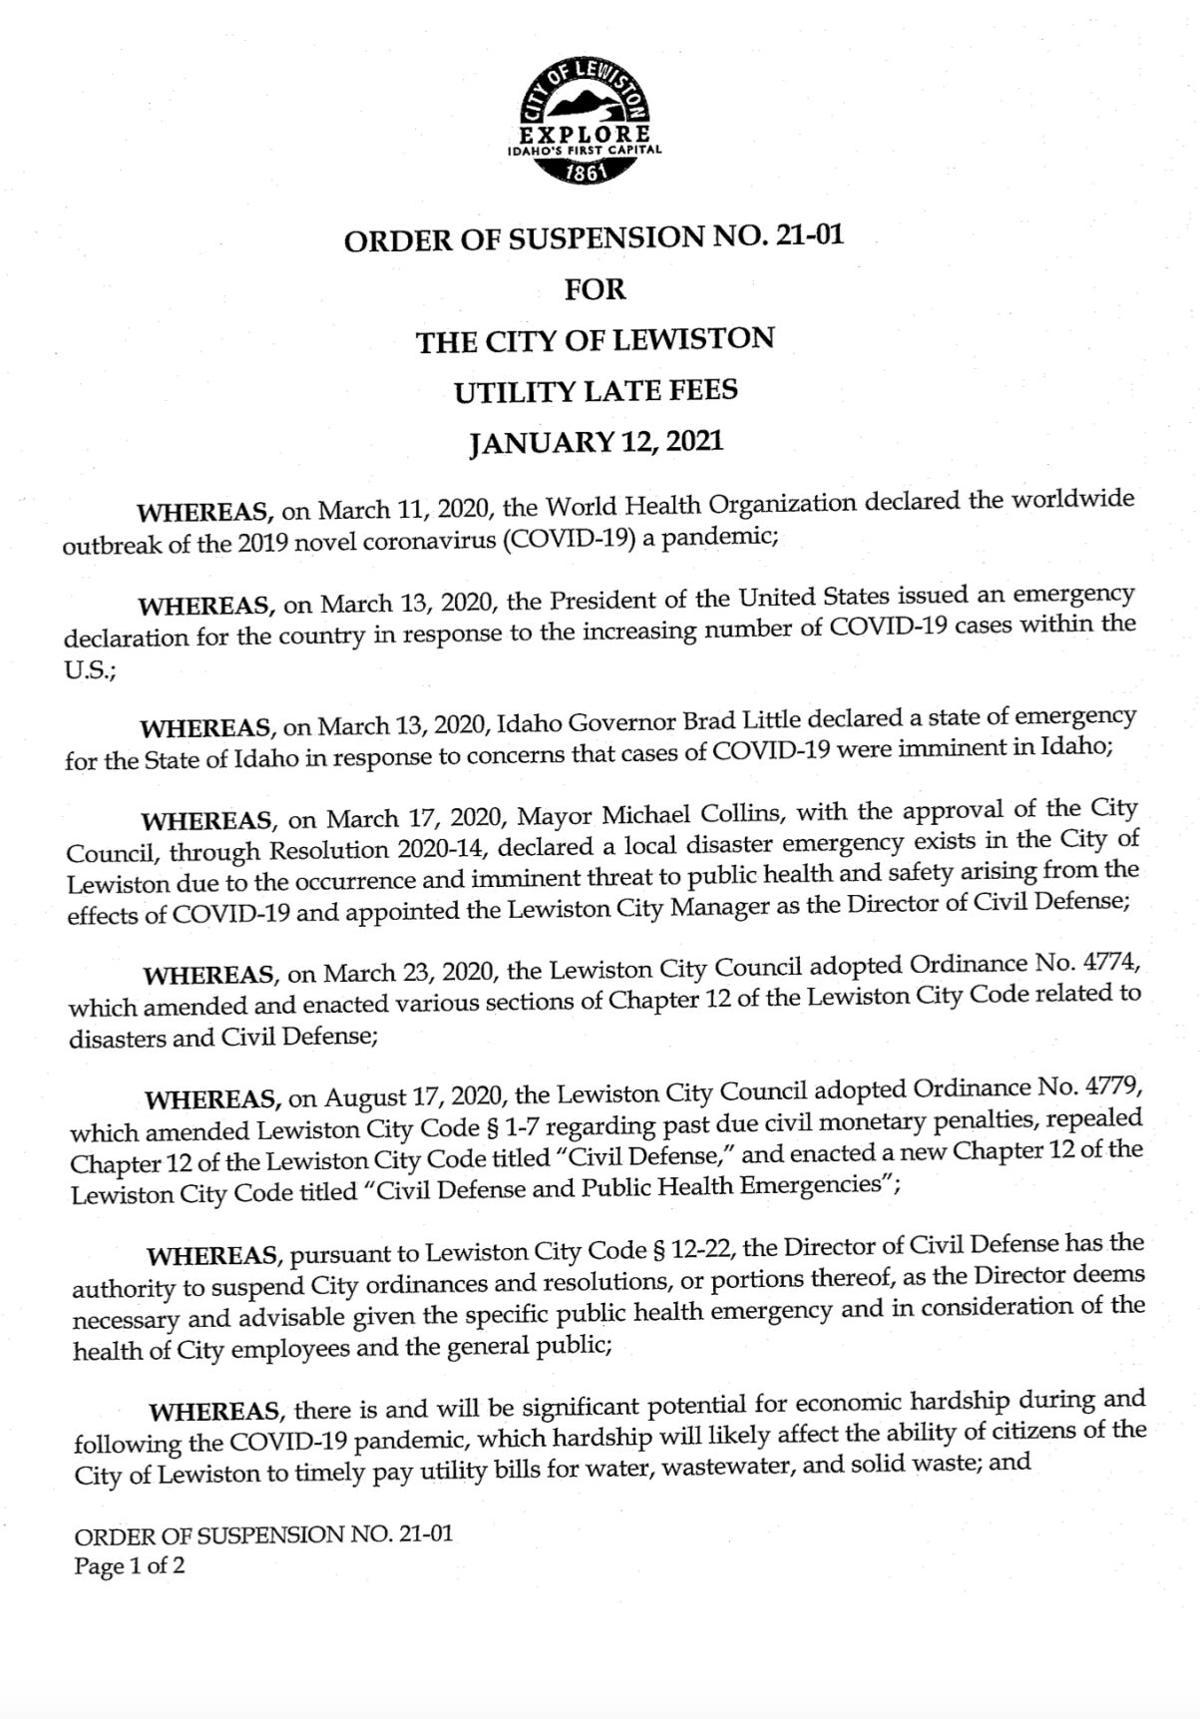 Lewiston Utility Bill Order